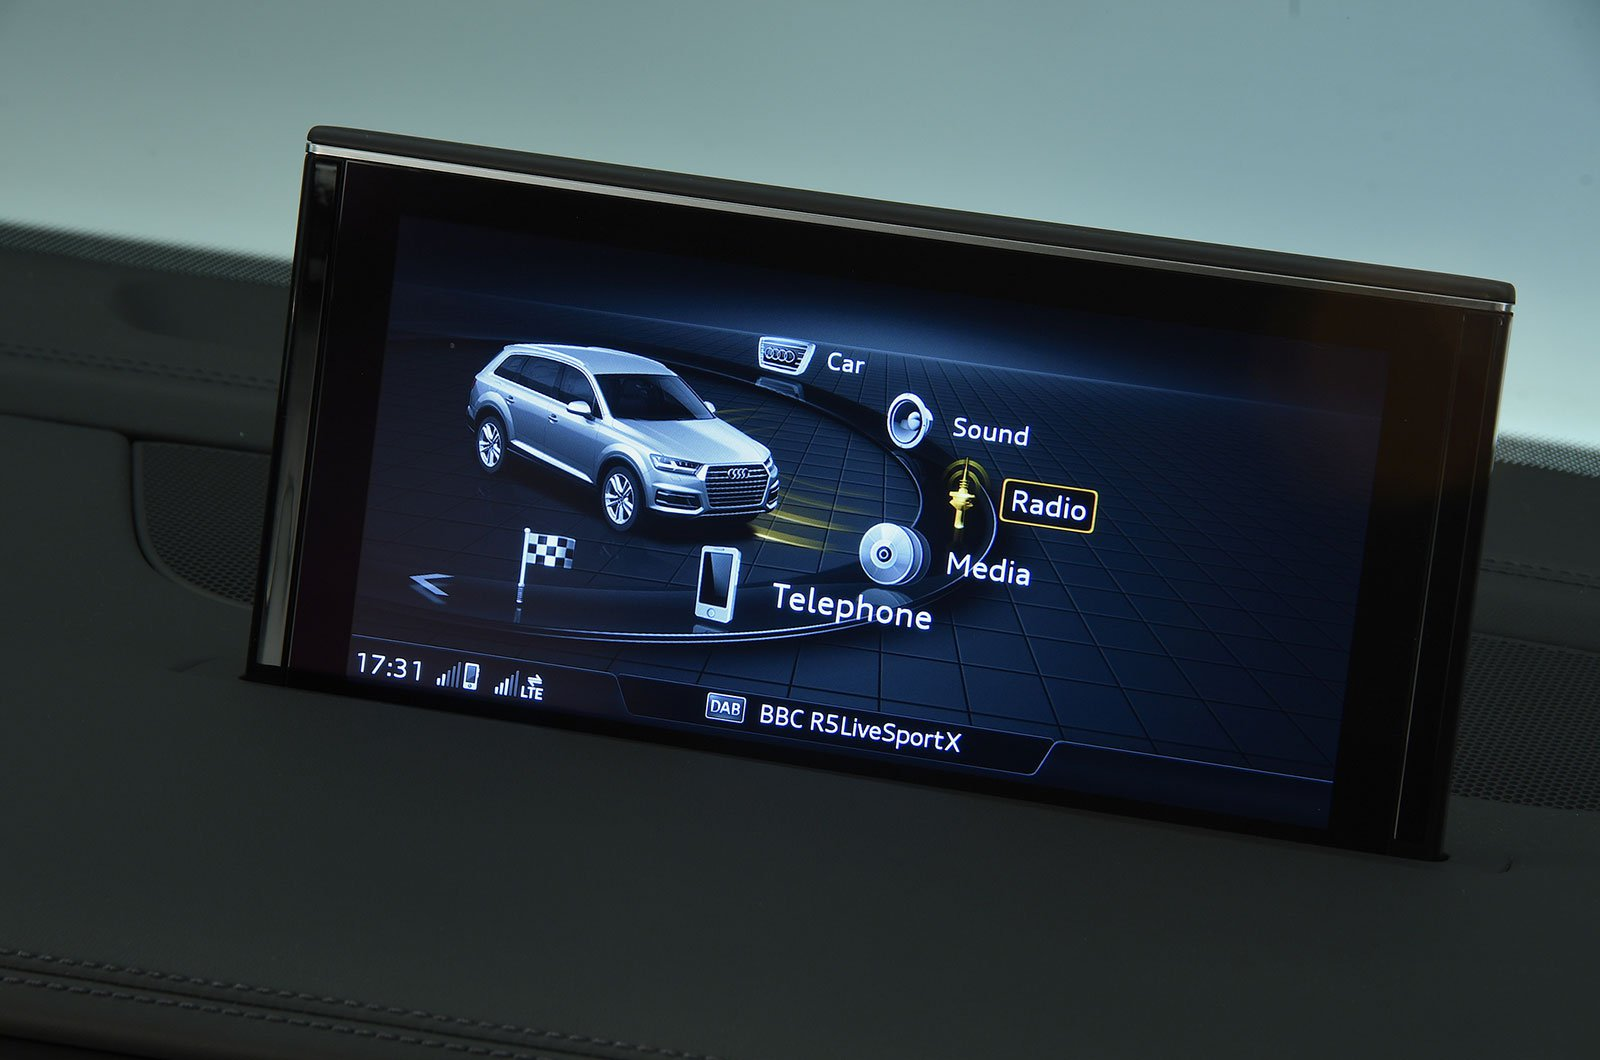 Audi SQ7 infotainment